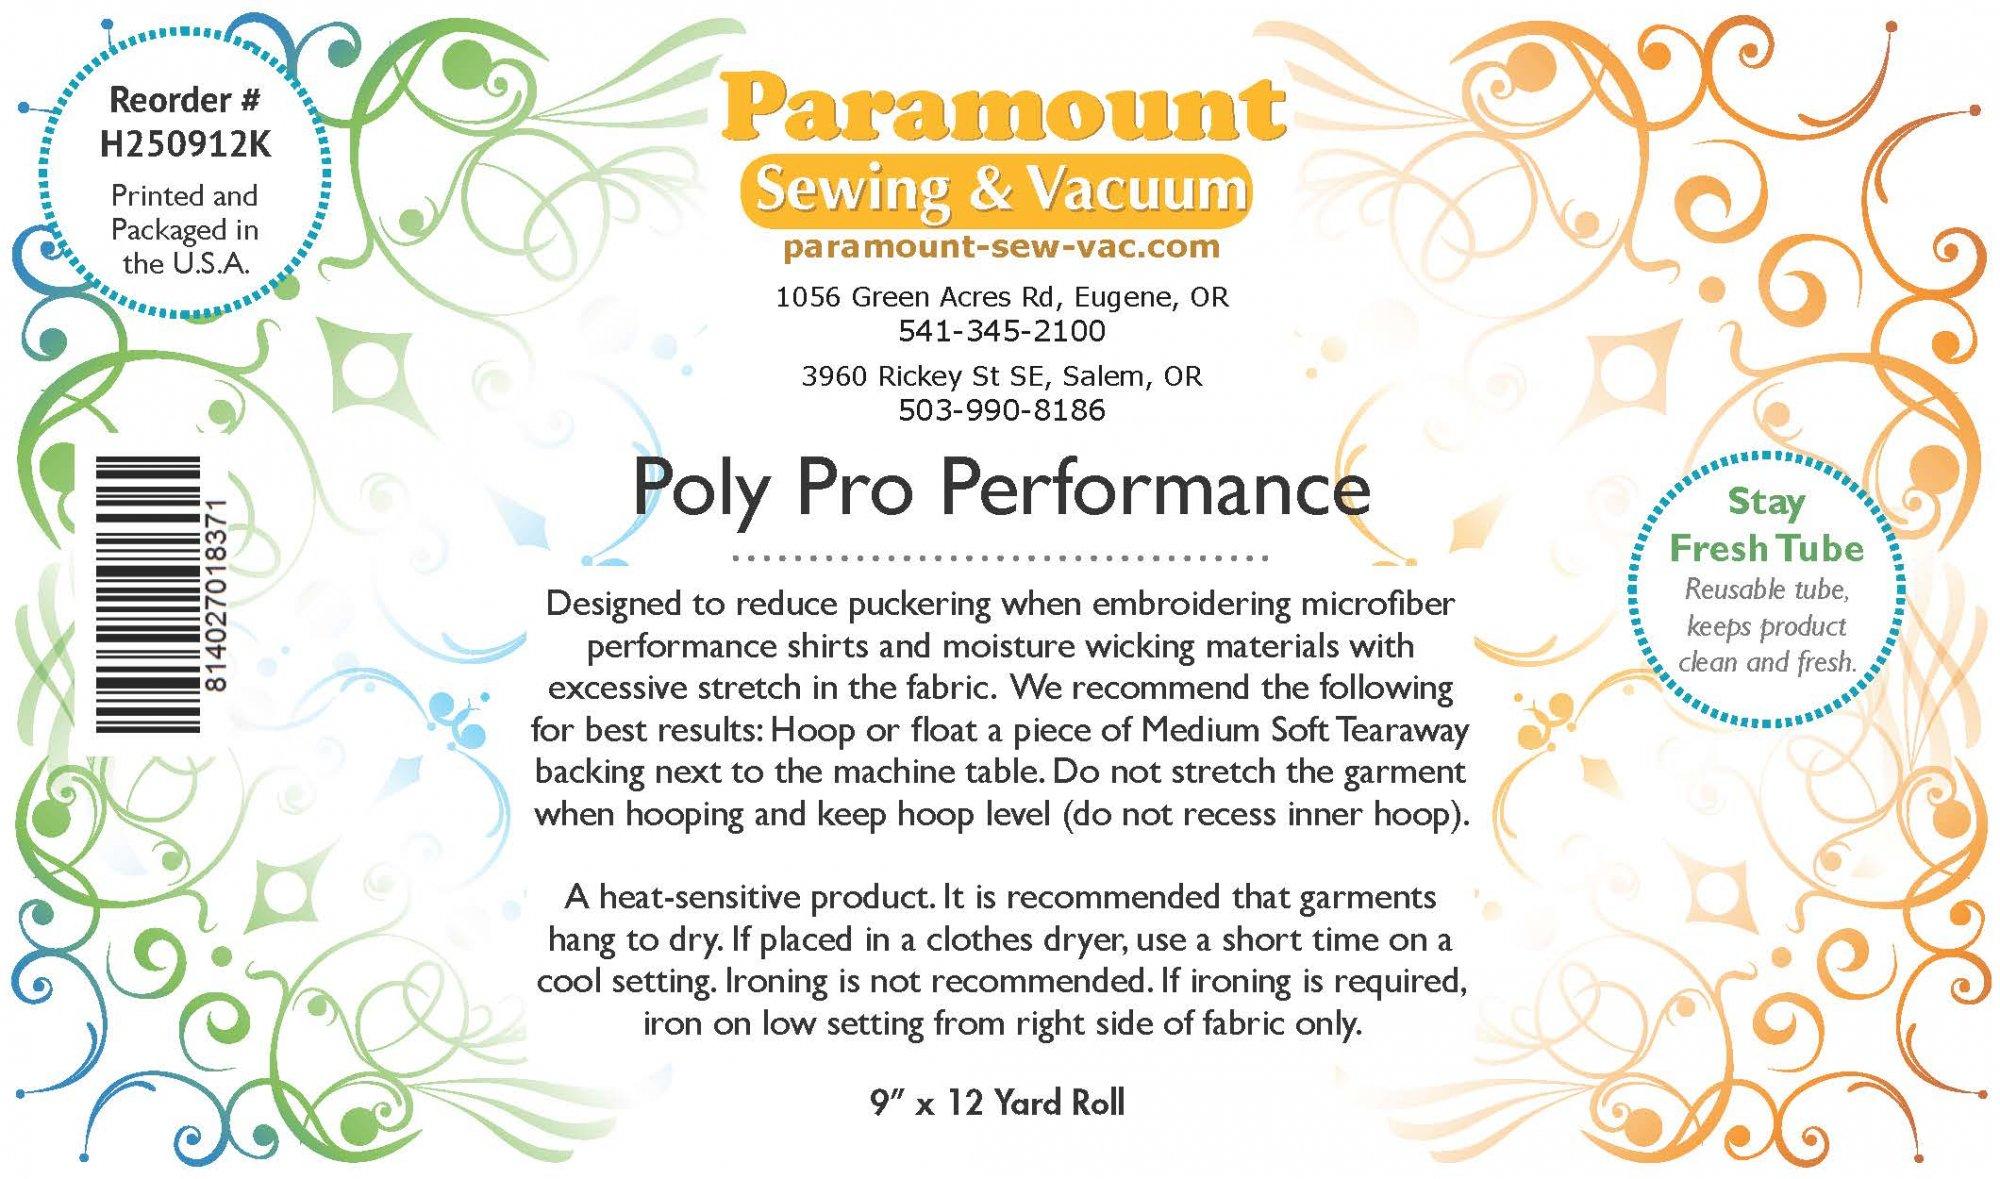 Paramount Stabilizer: PolyPro Performance